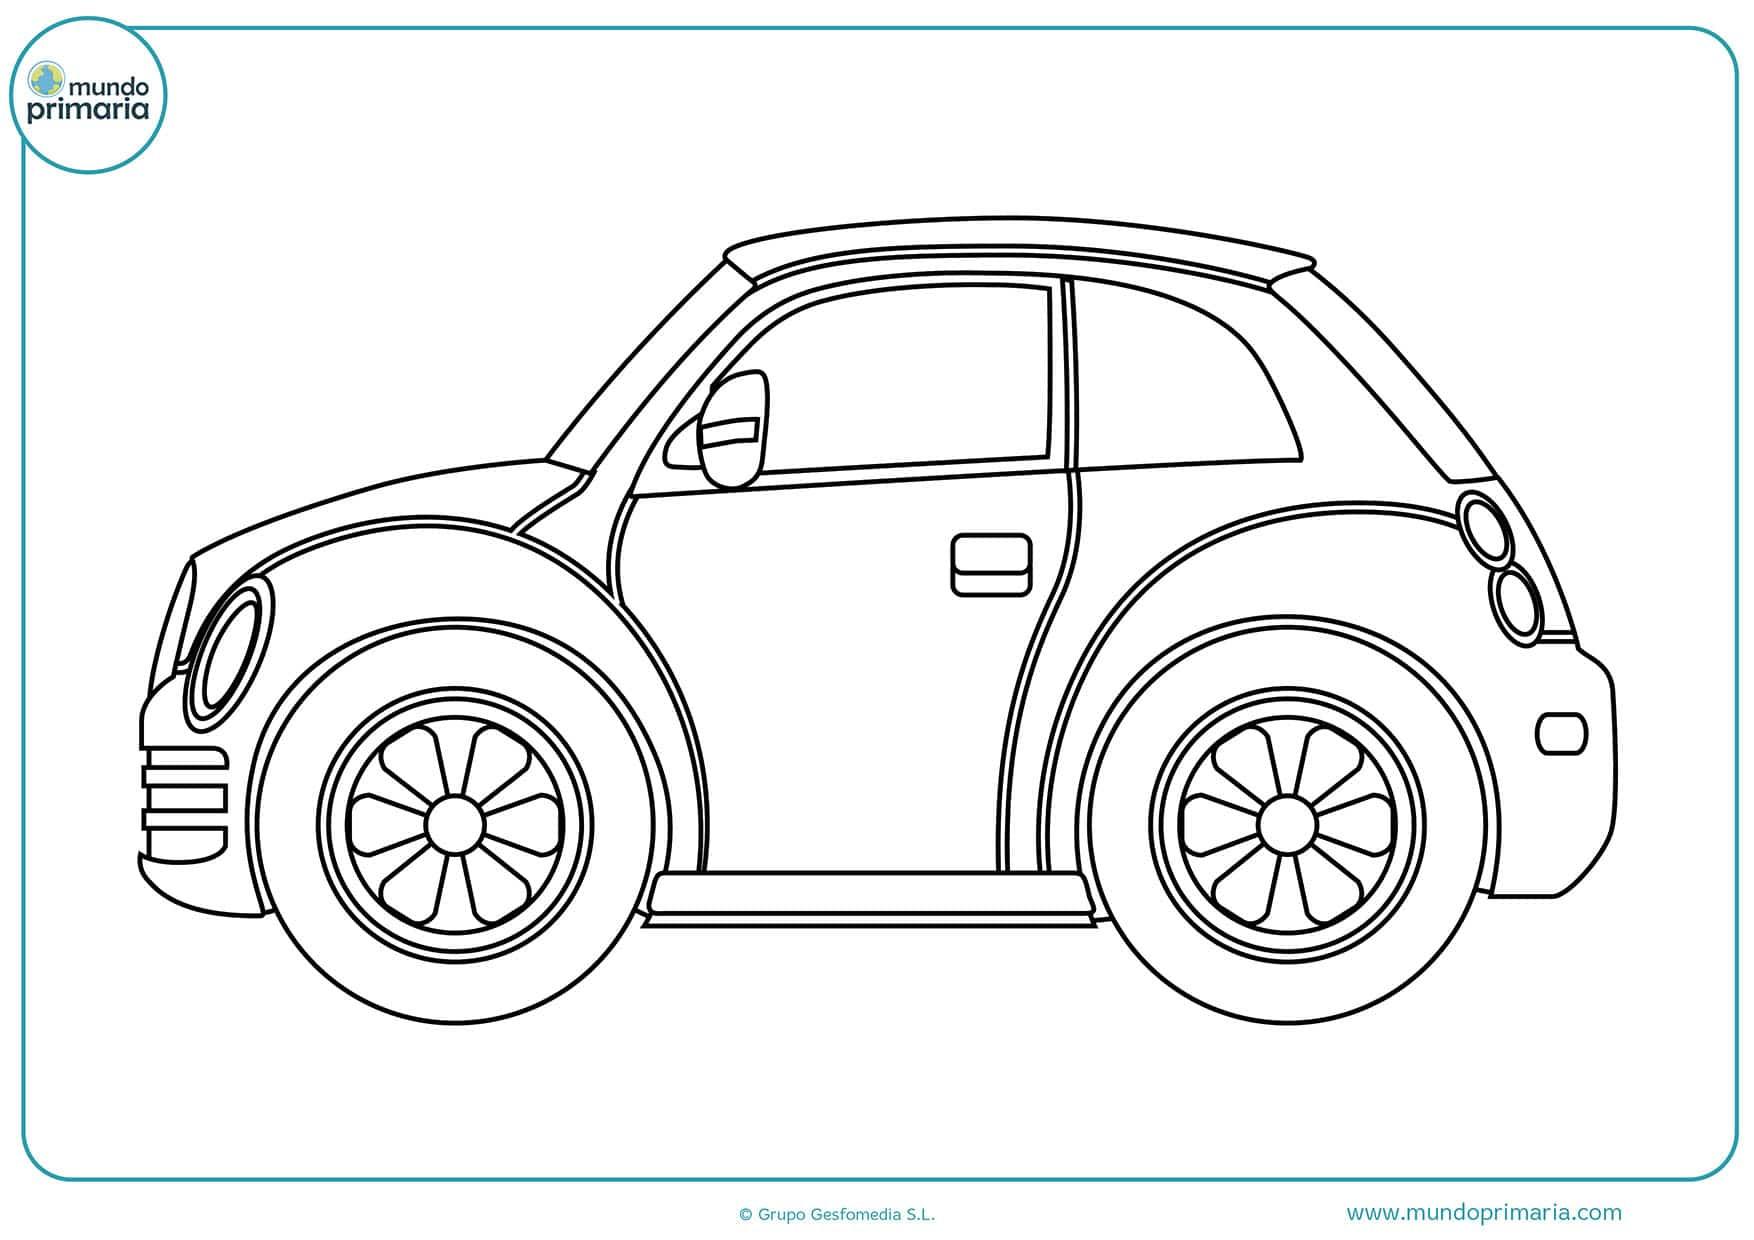 Dibujos de coches para colorear   Mundo Primaria